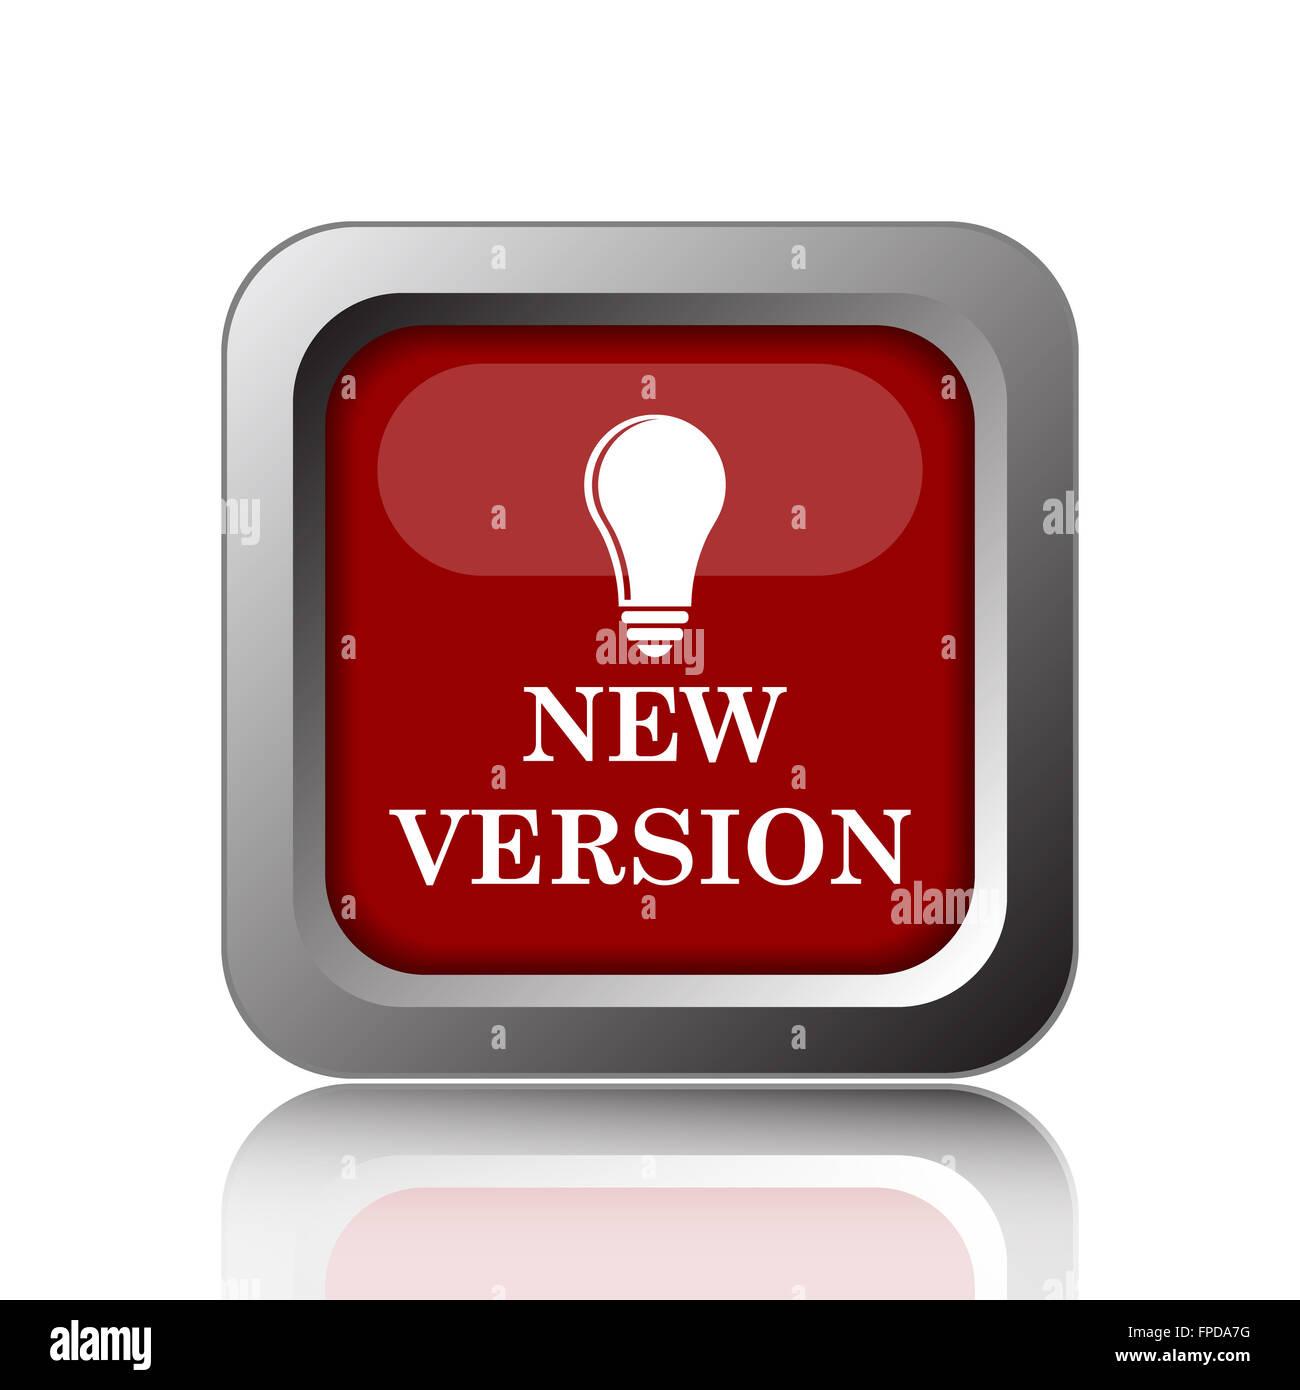 New version icon. Internet button on white background - Stock Image